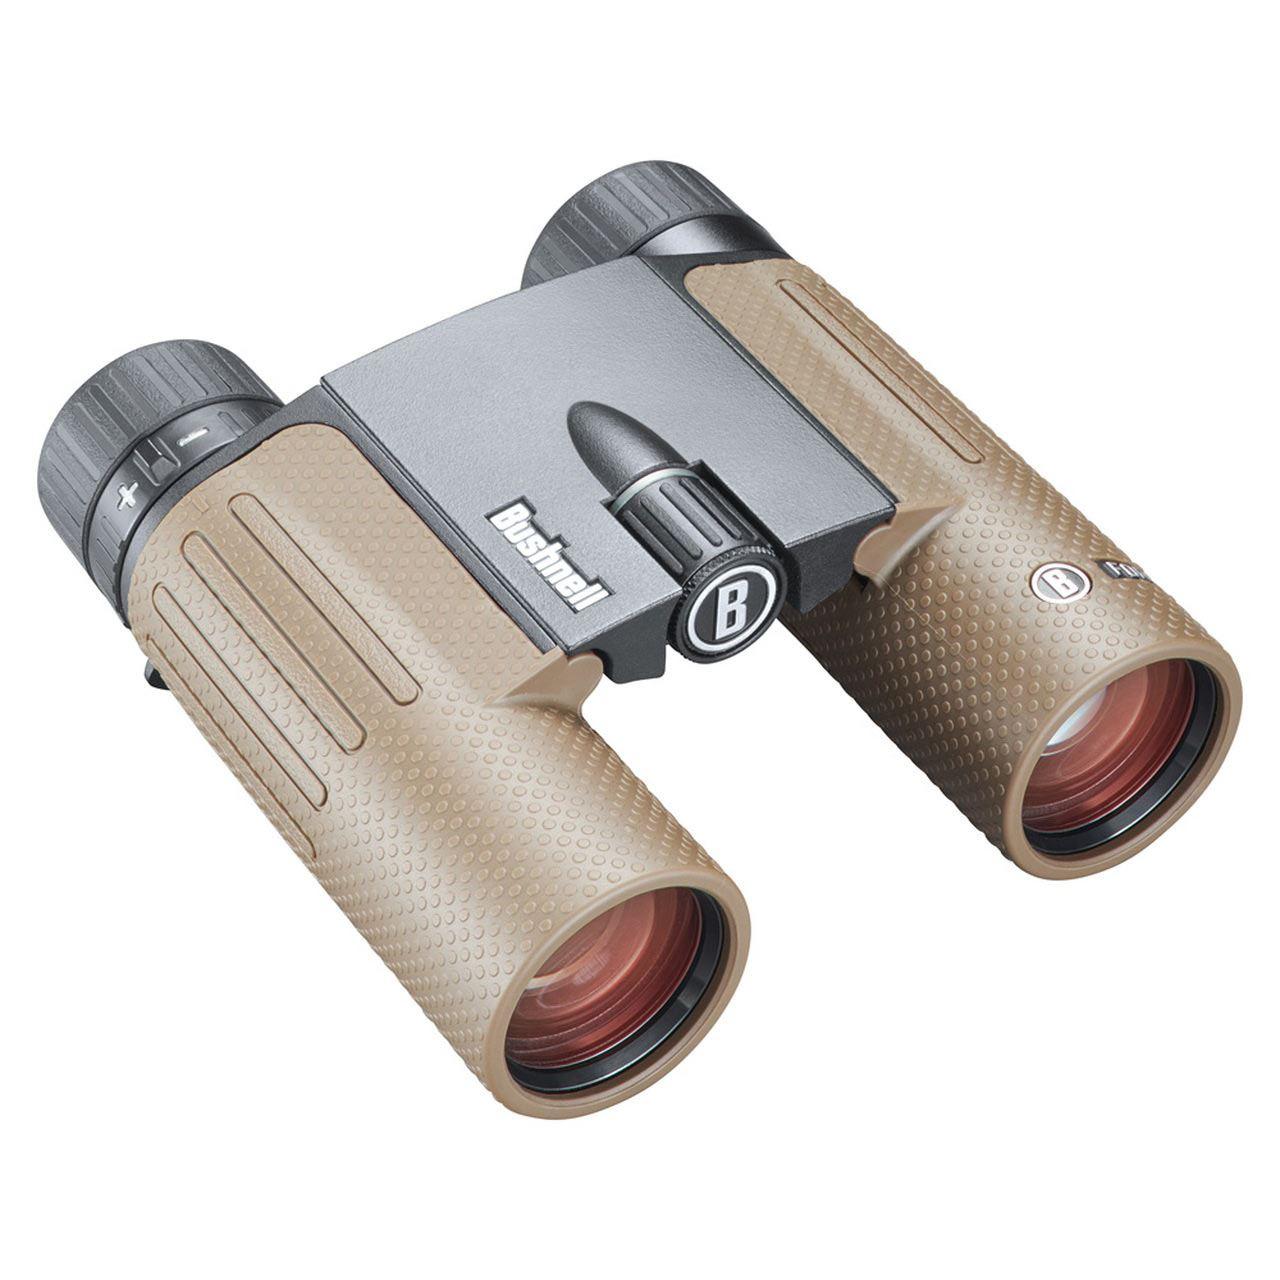 Image of Bushnell Forge 10x30 Binoculars